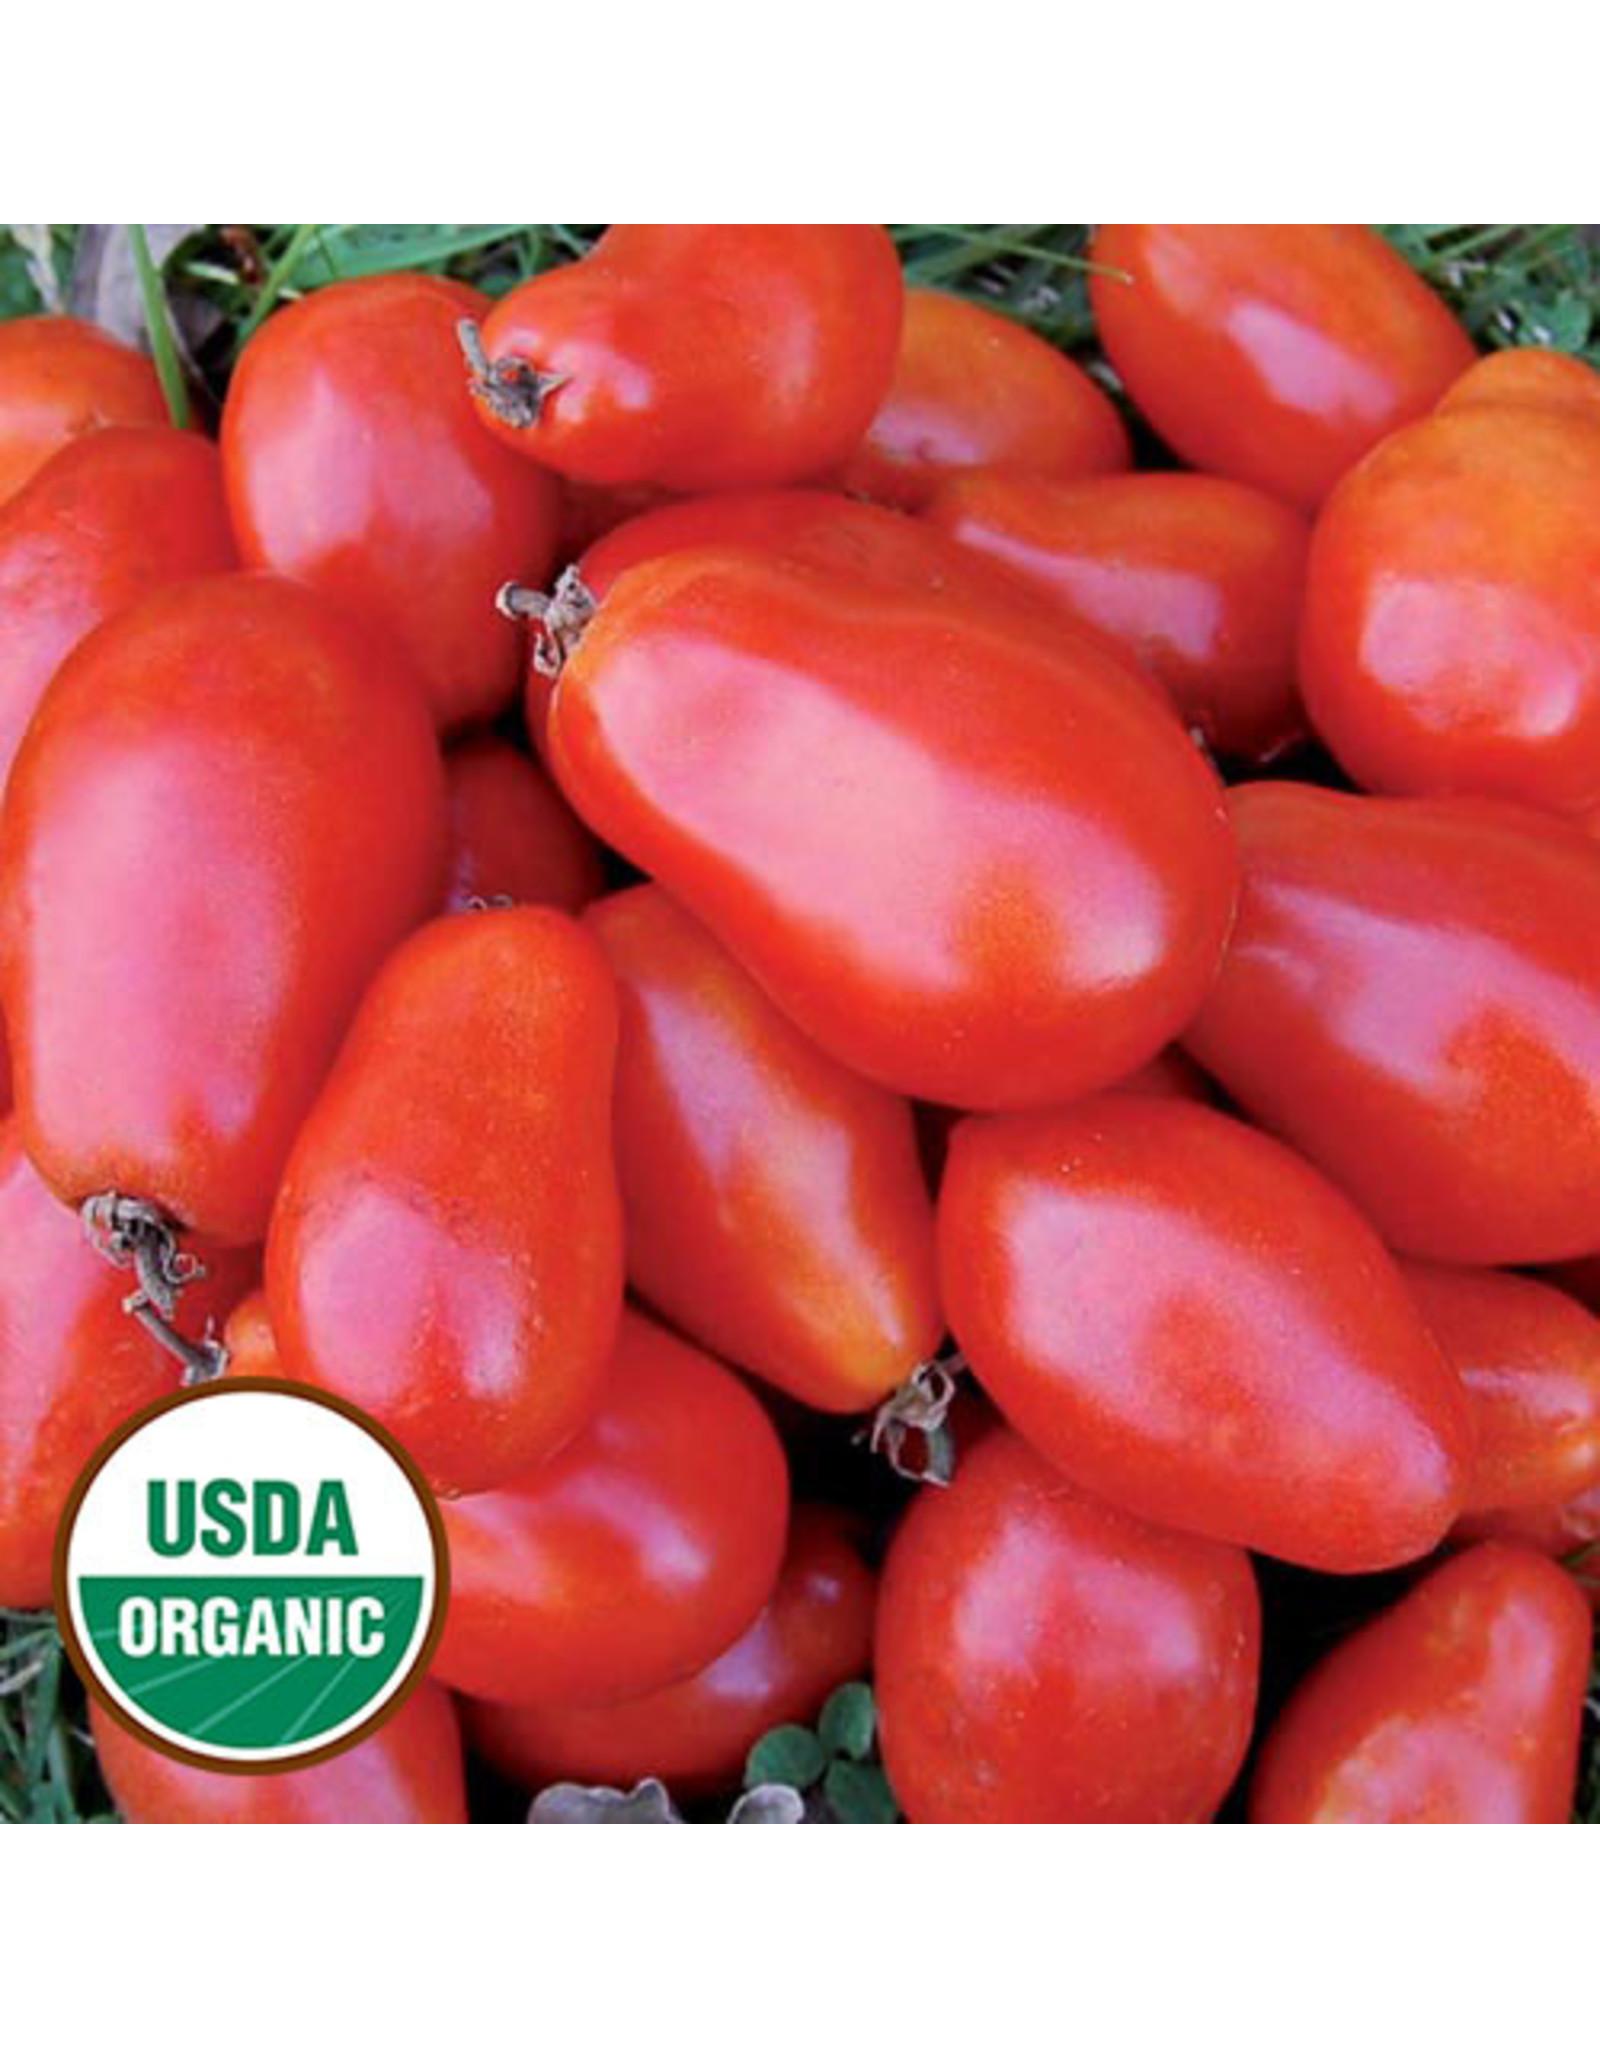 Seed Savers Tomato - Martino's Roma